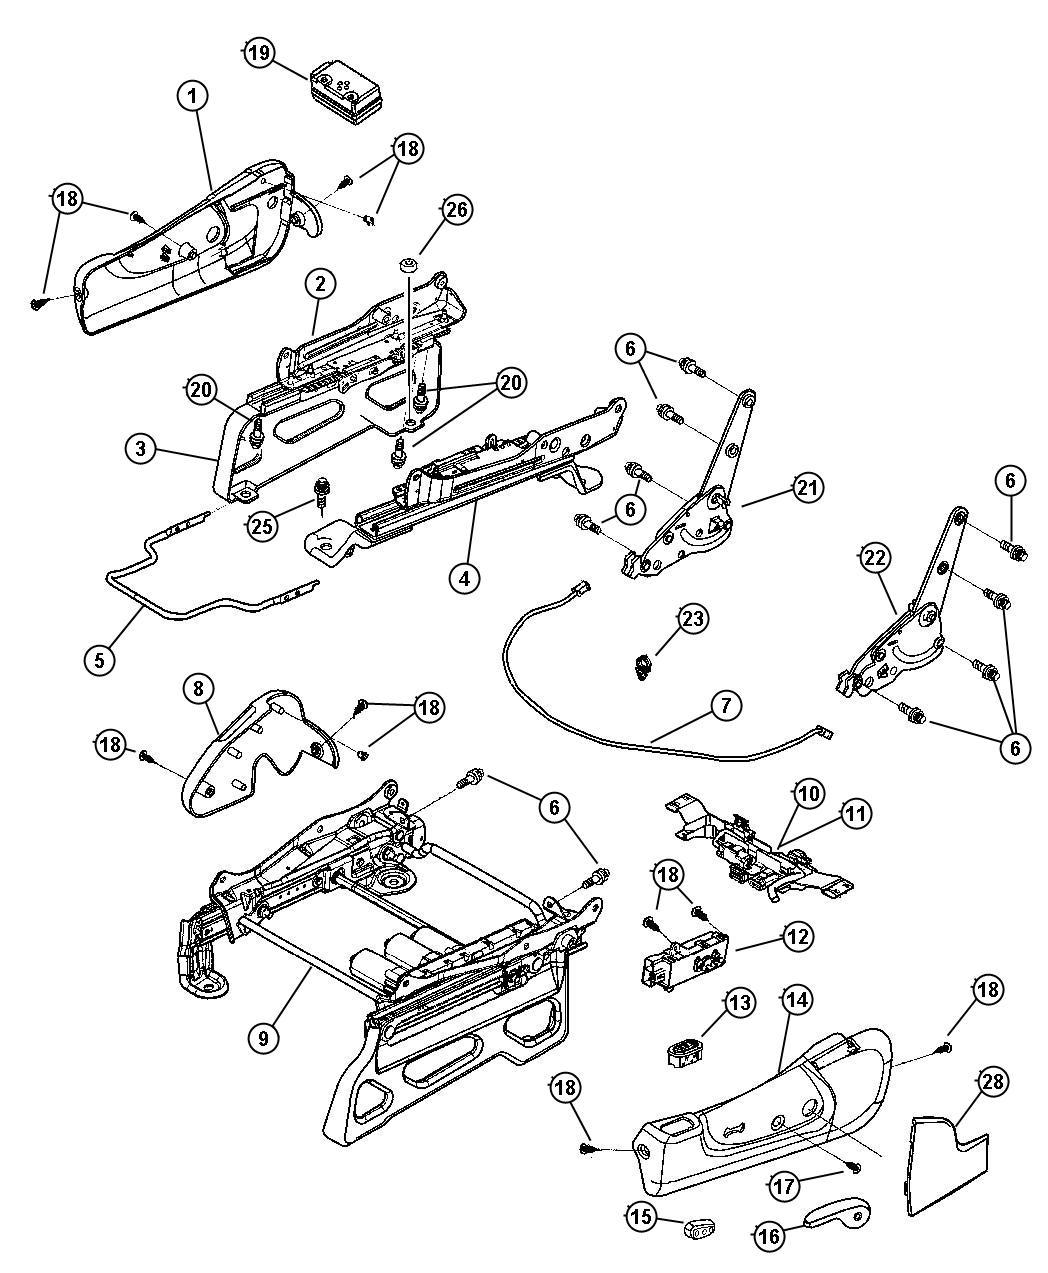 Np231 Parts Diagram